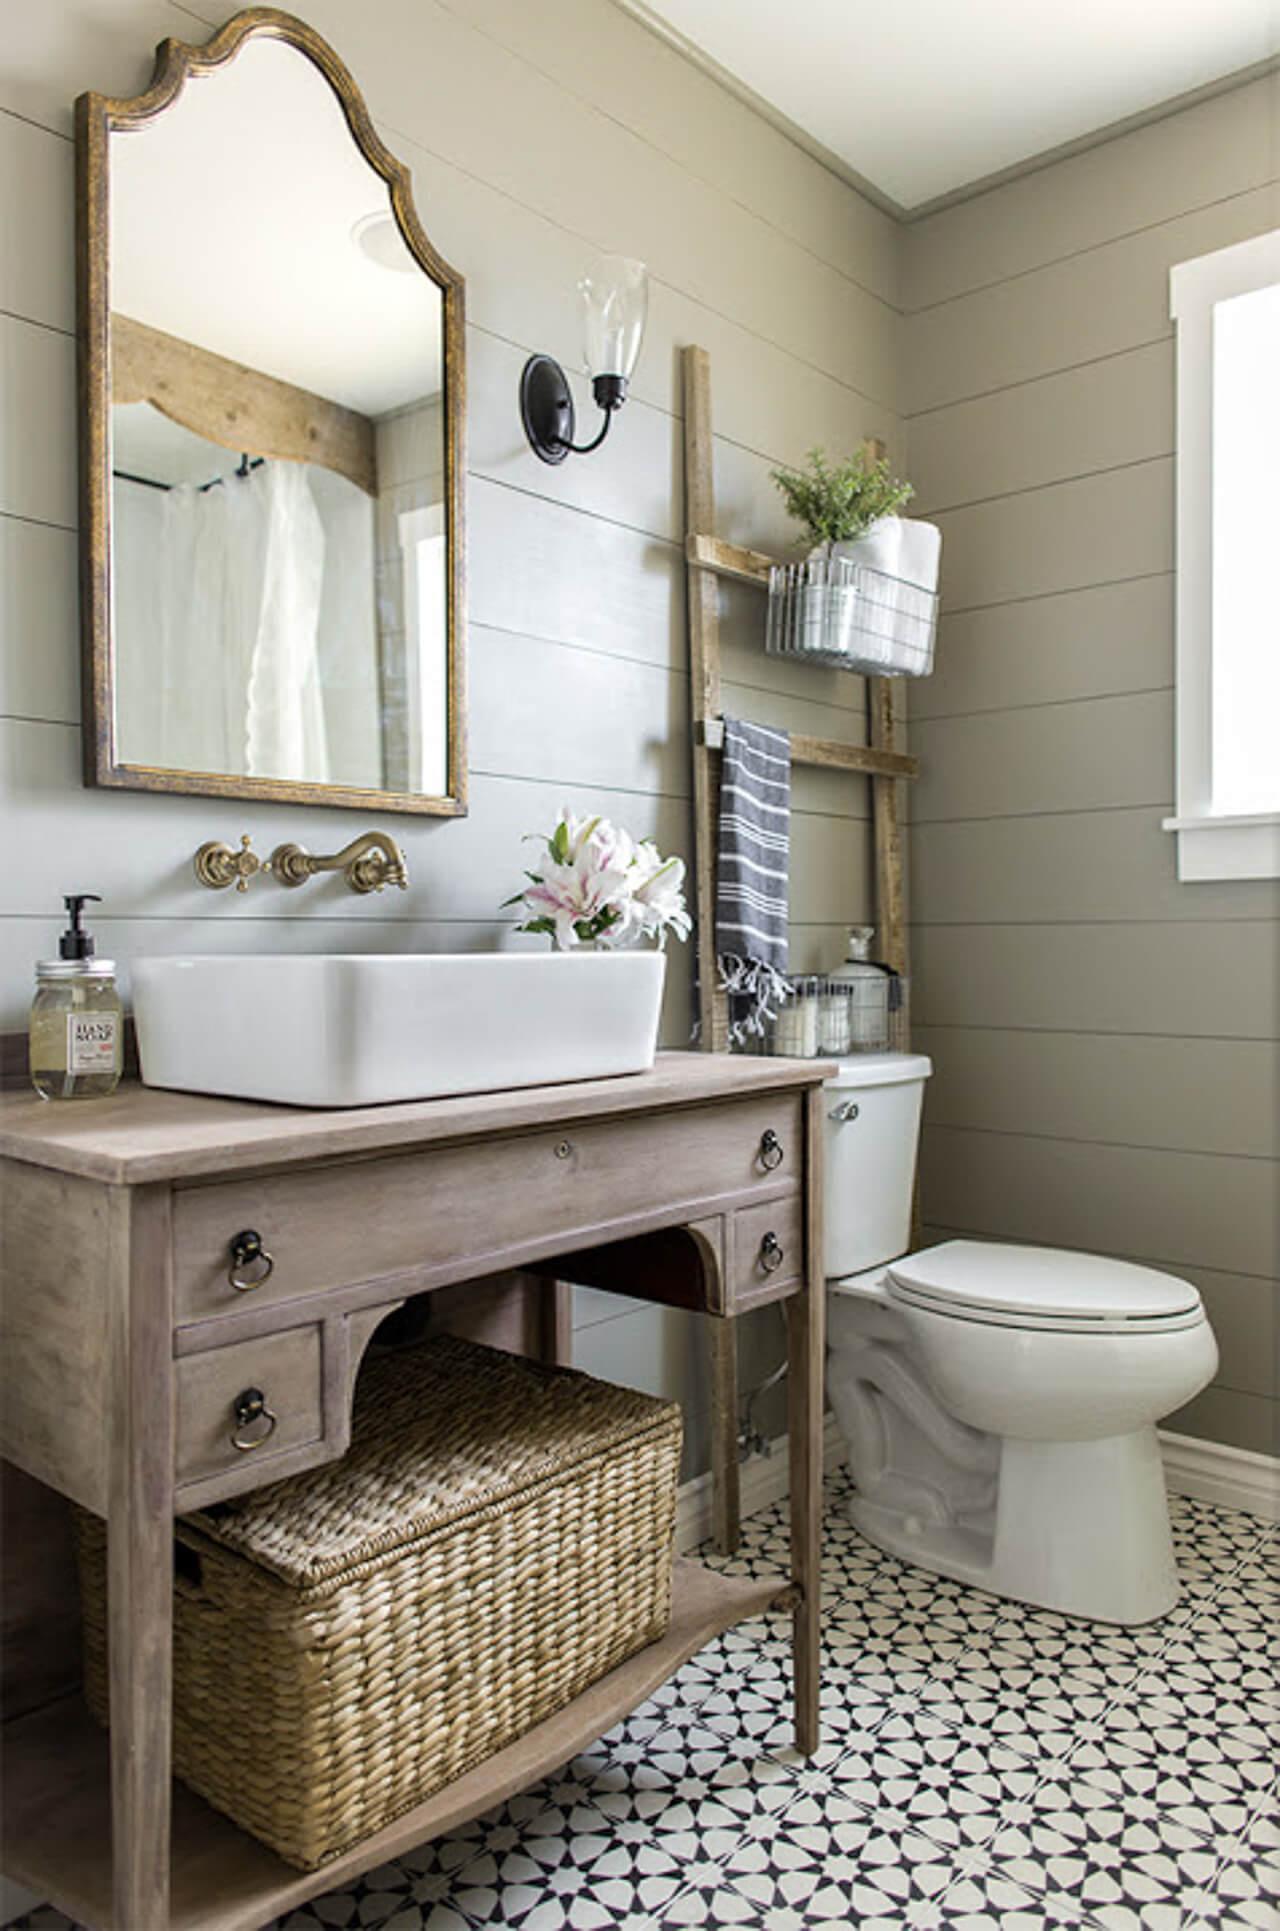 This rustic bathroom inspiration is so cute! - M Loves M @marmar